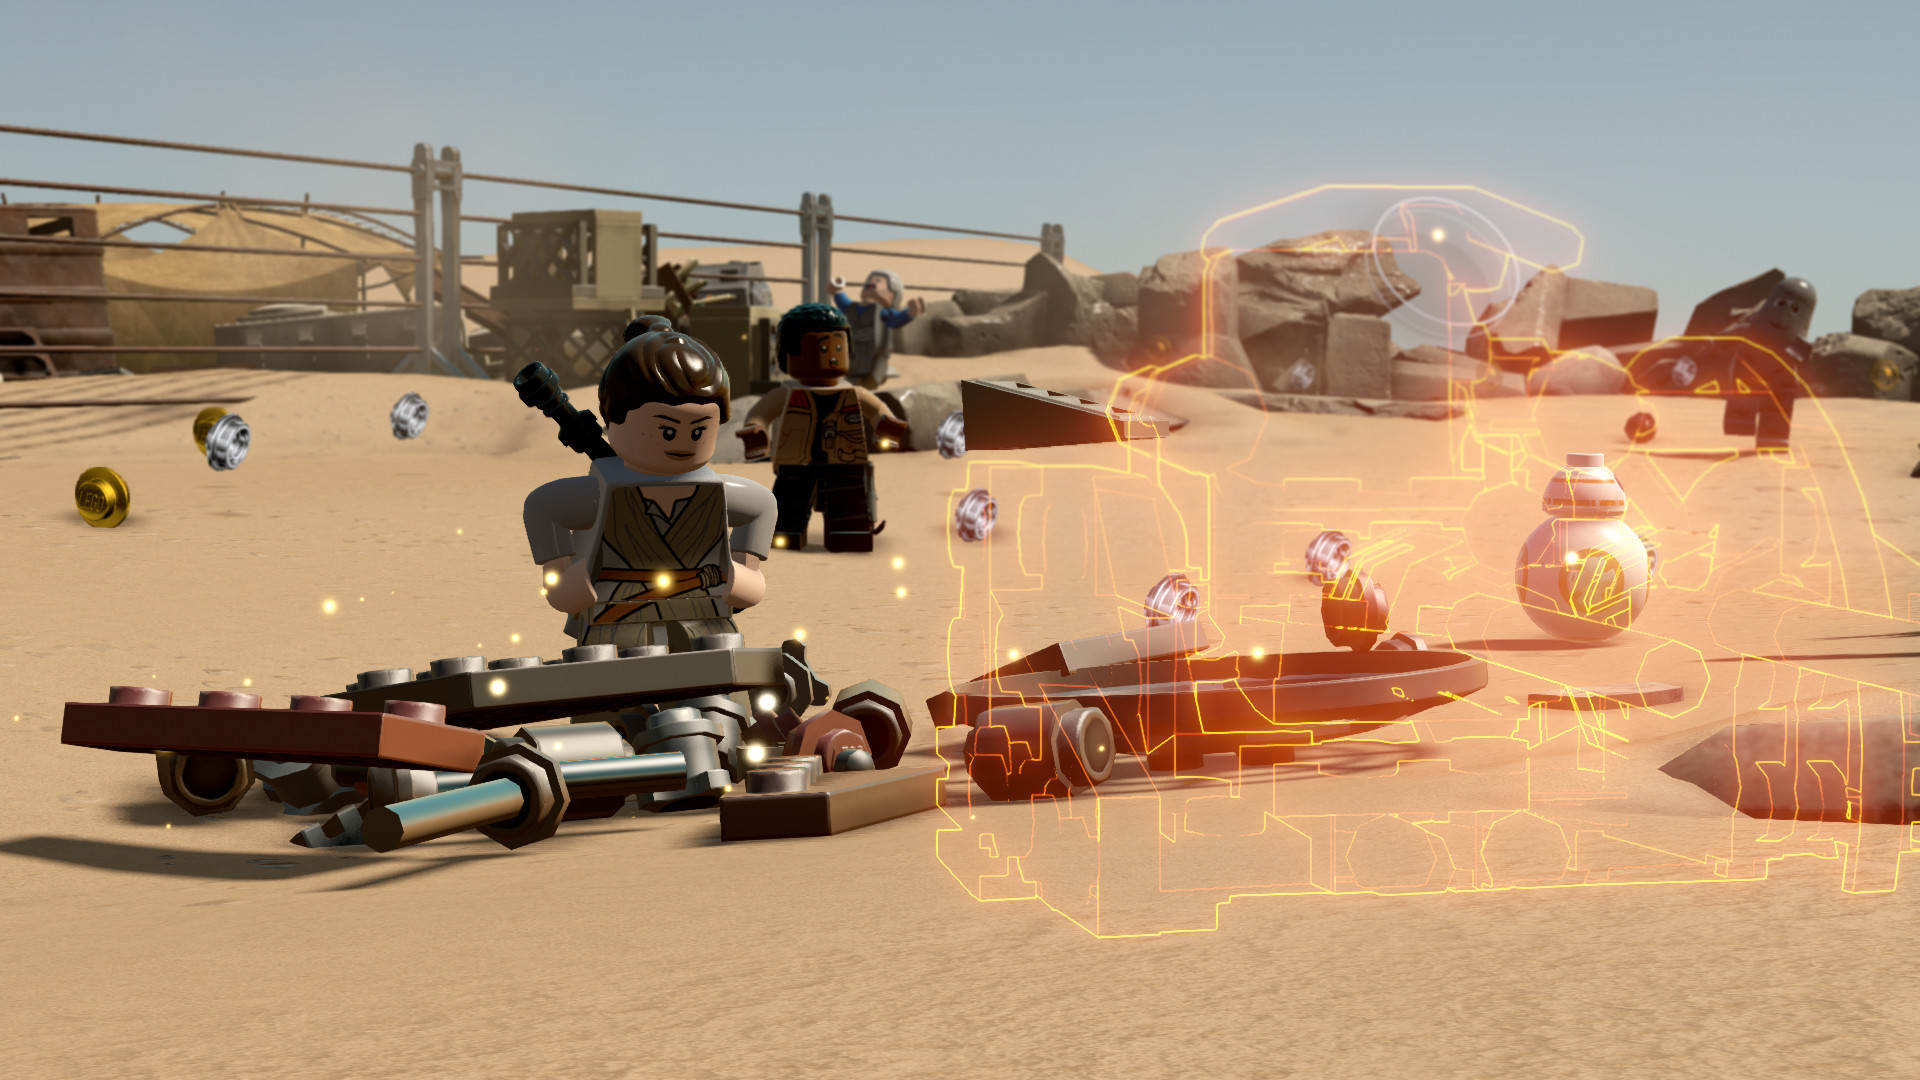 LEGO STAR WARS The Force Awakens Repack